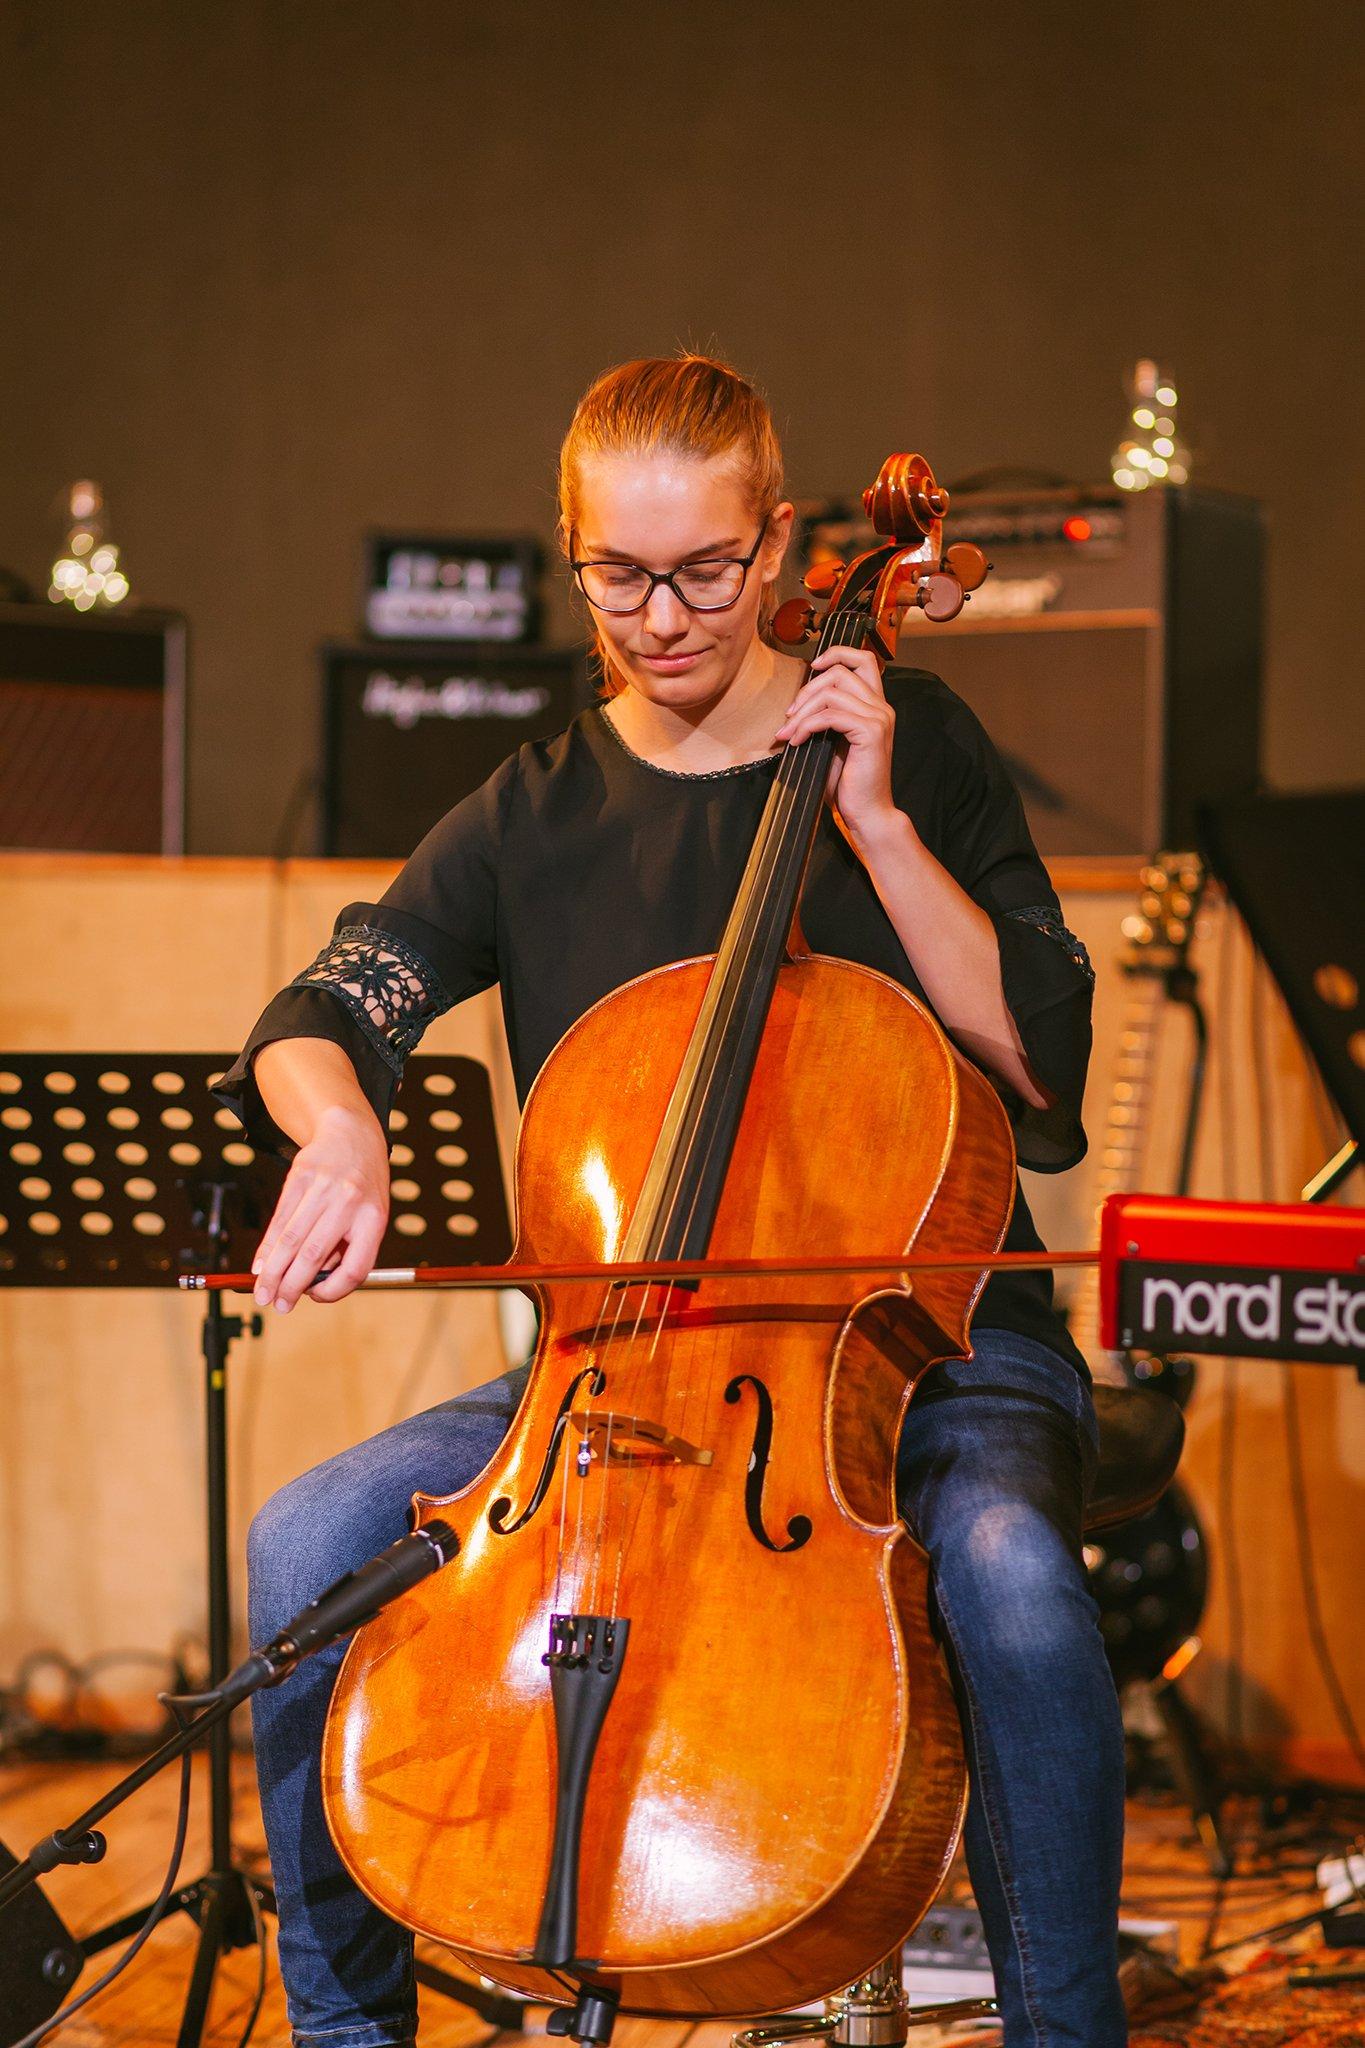 Eben-Ezer-Sessions am 18.10.2019: Johanna Peter (Foto: Knut Burmeister, ALLTAG)